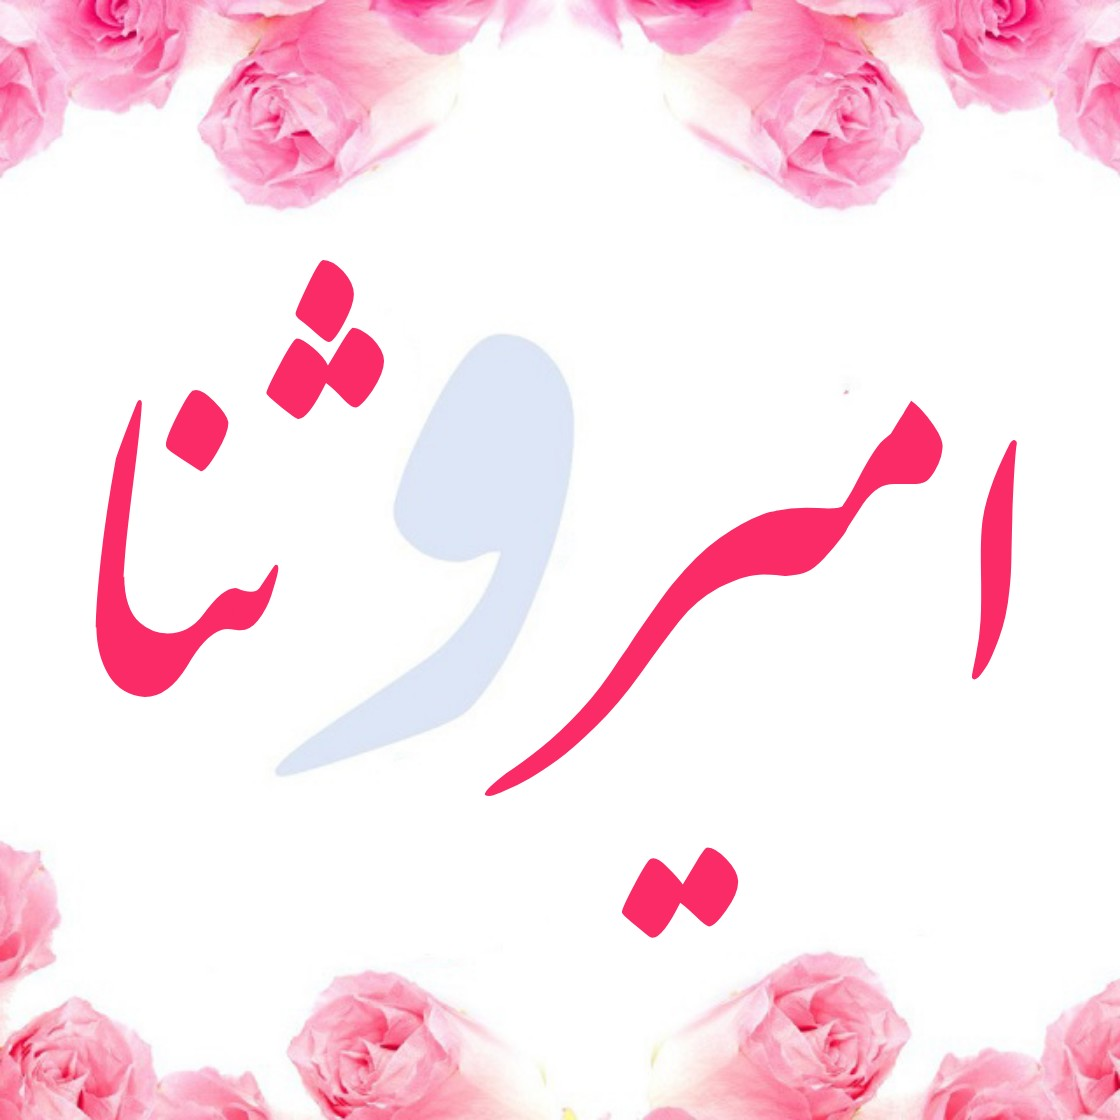 عکس پروفایل اسم ثنا و امیر